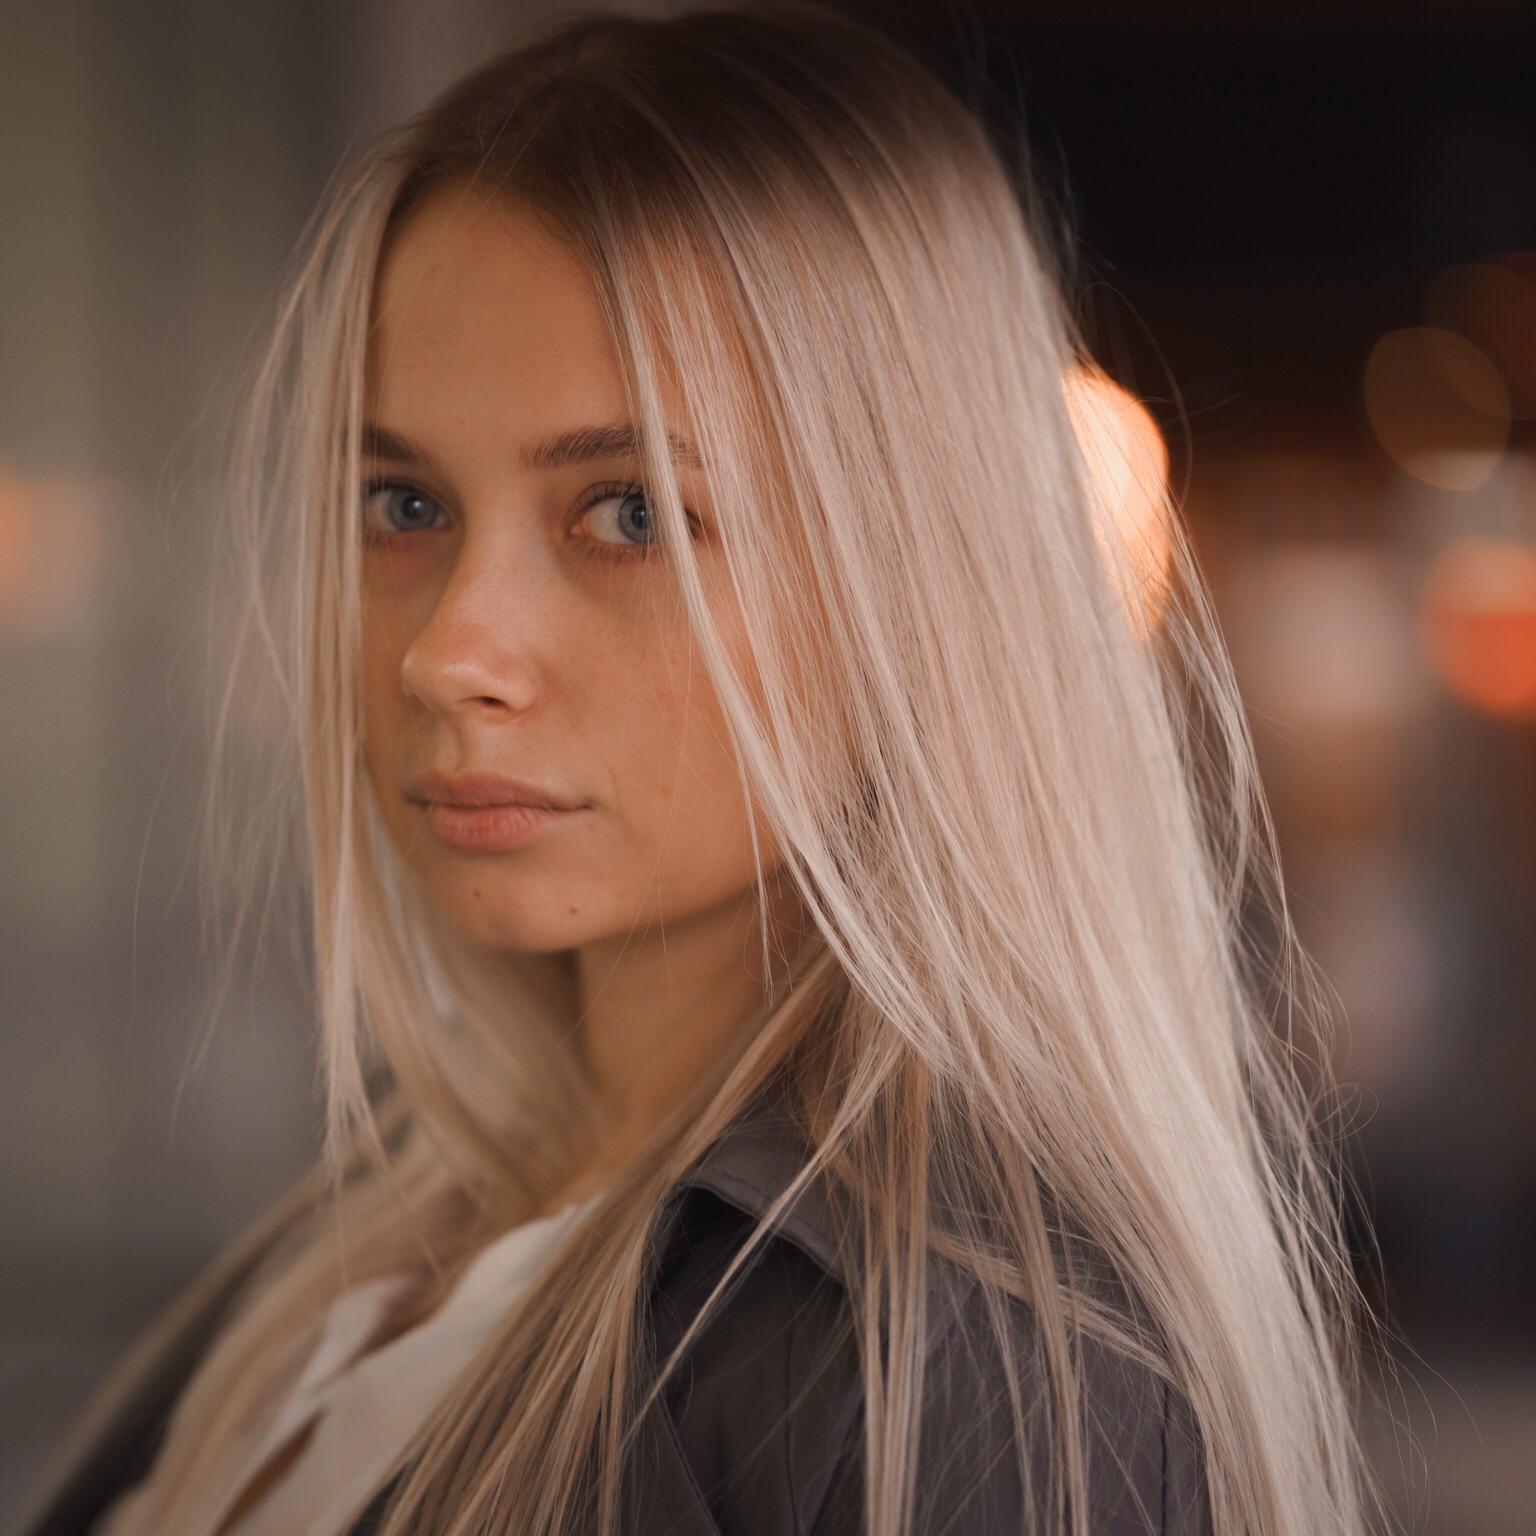 annataratorki94